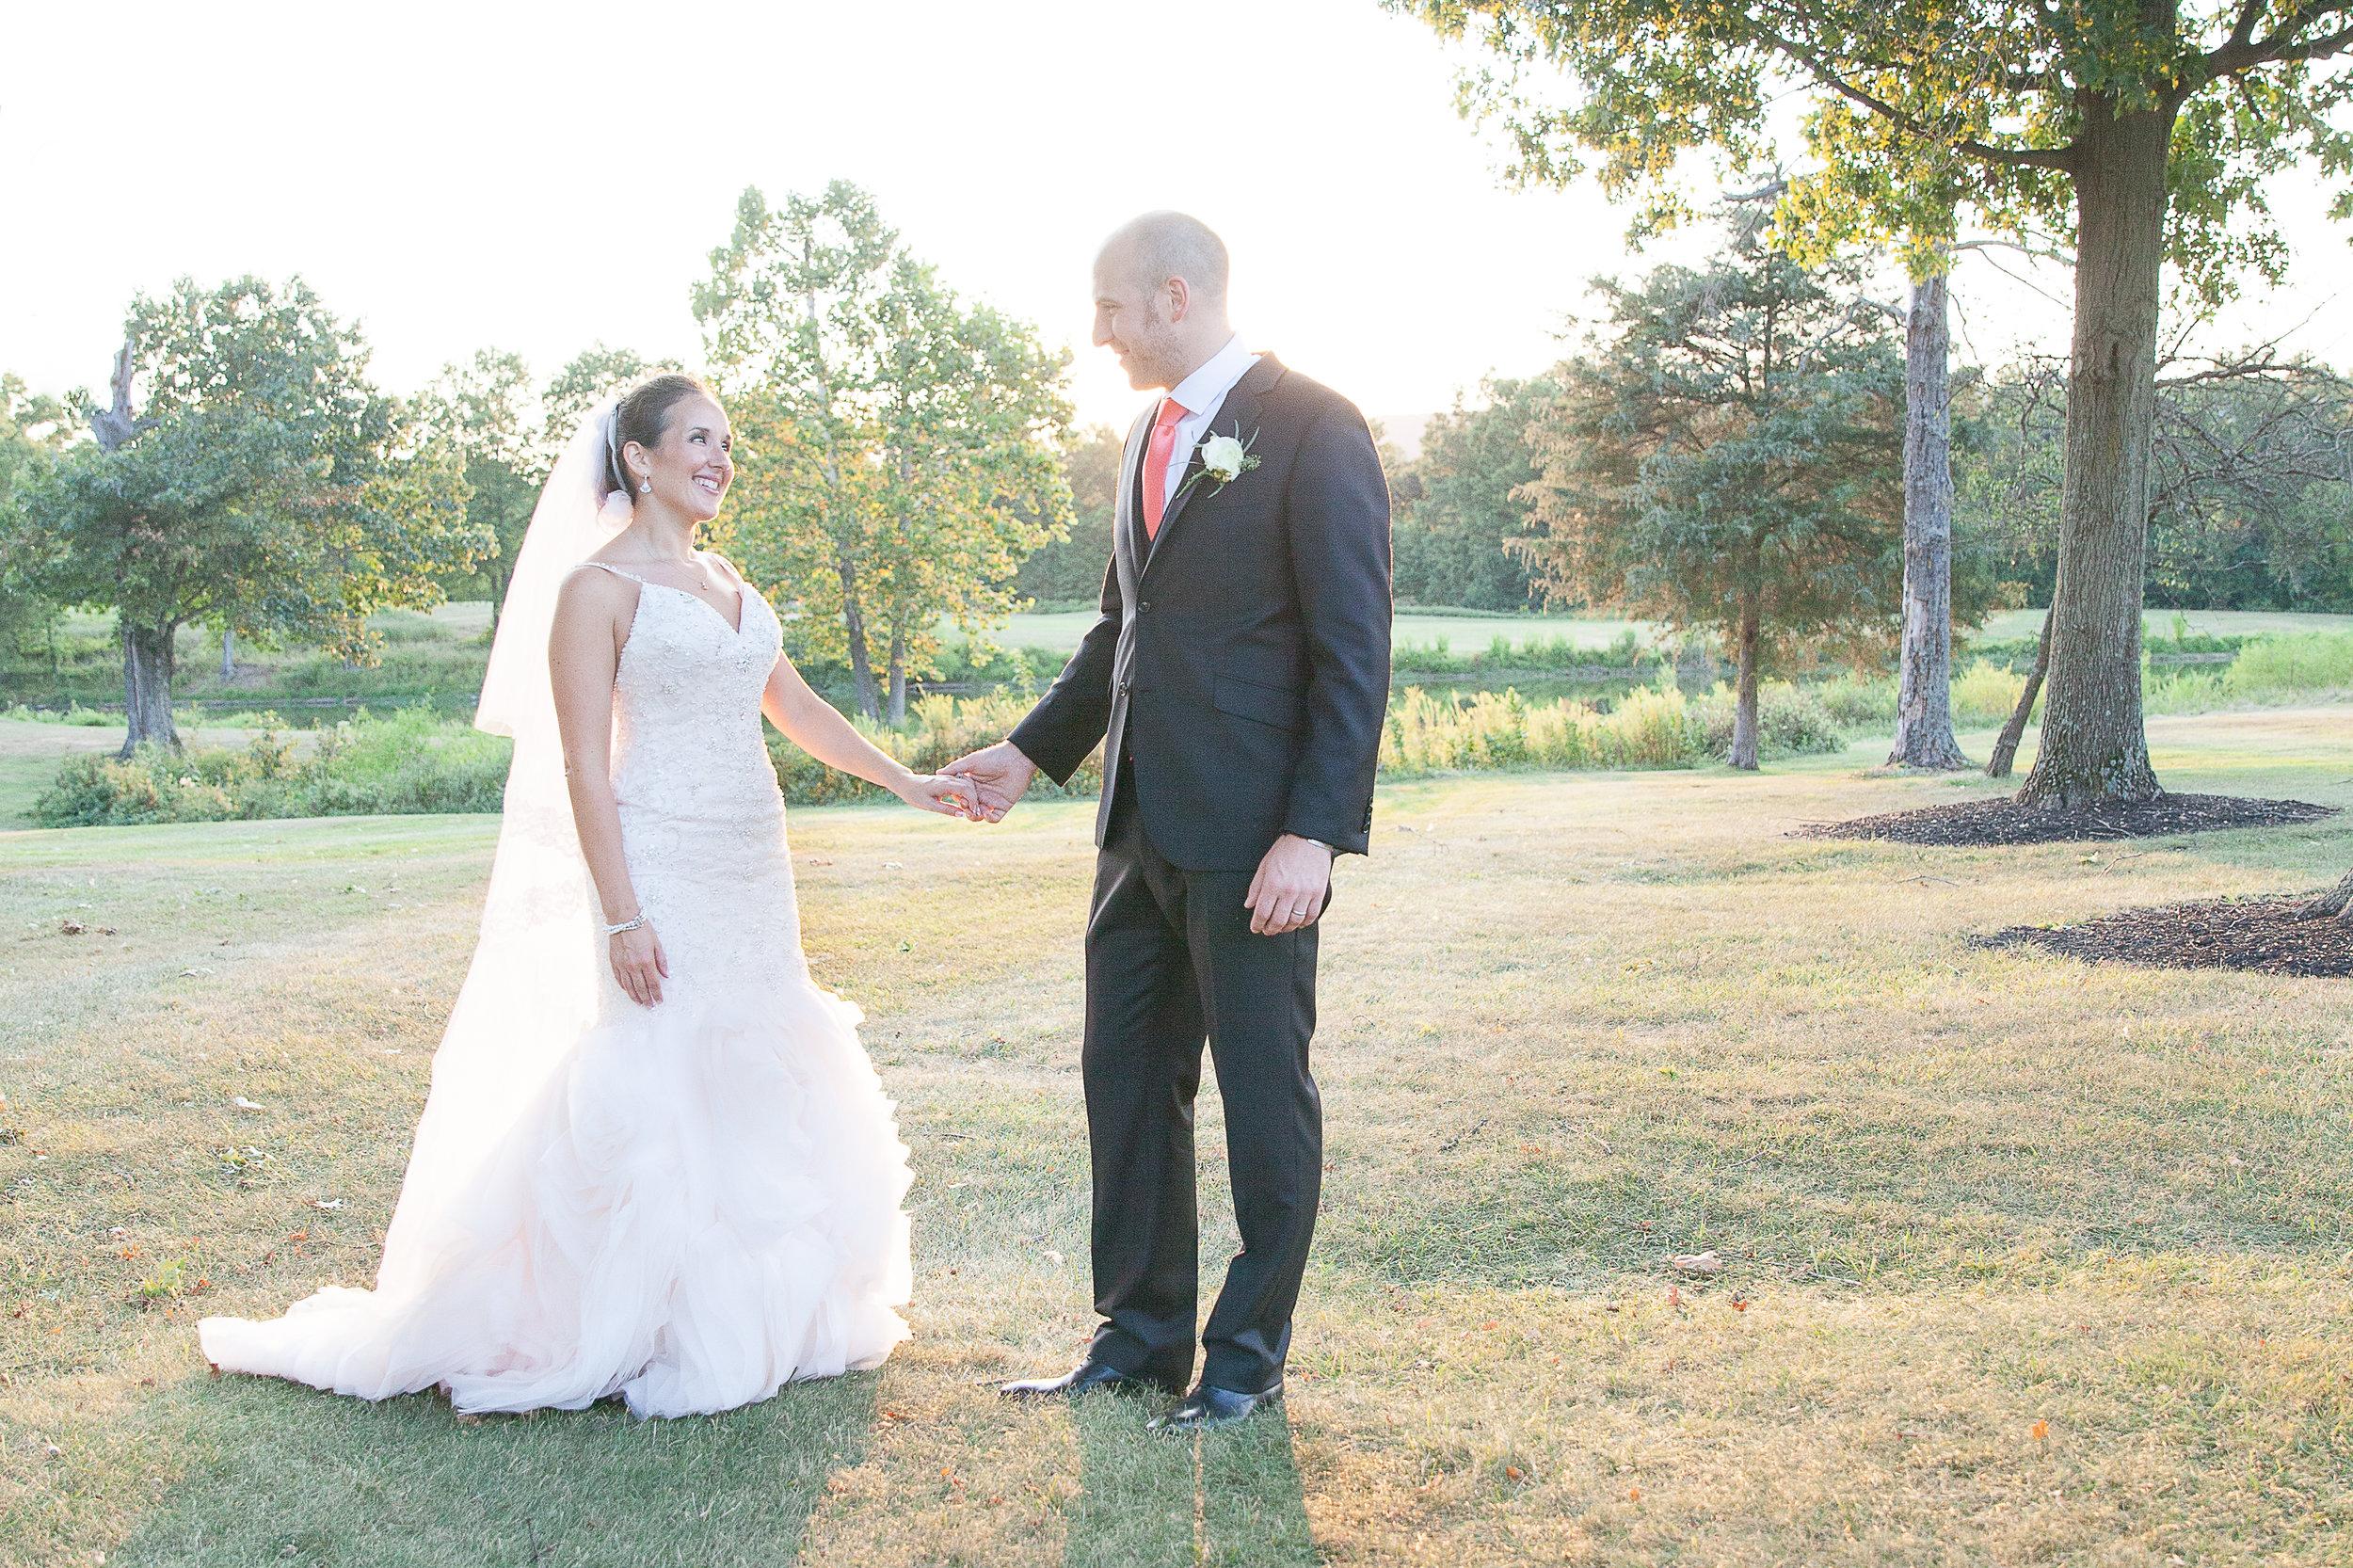 Marissa-Timon-Wedding-Kim-Pham-Clark-Photography-13.jpg